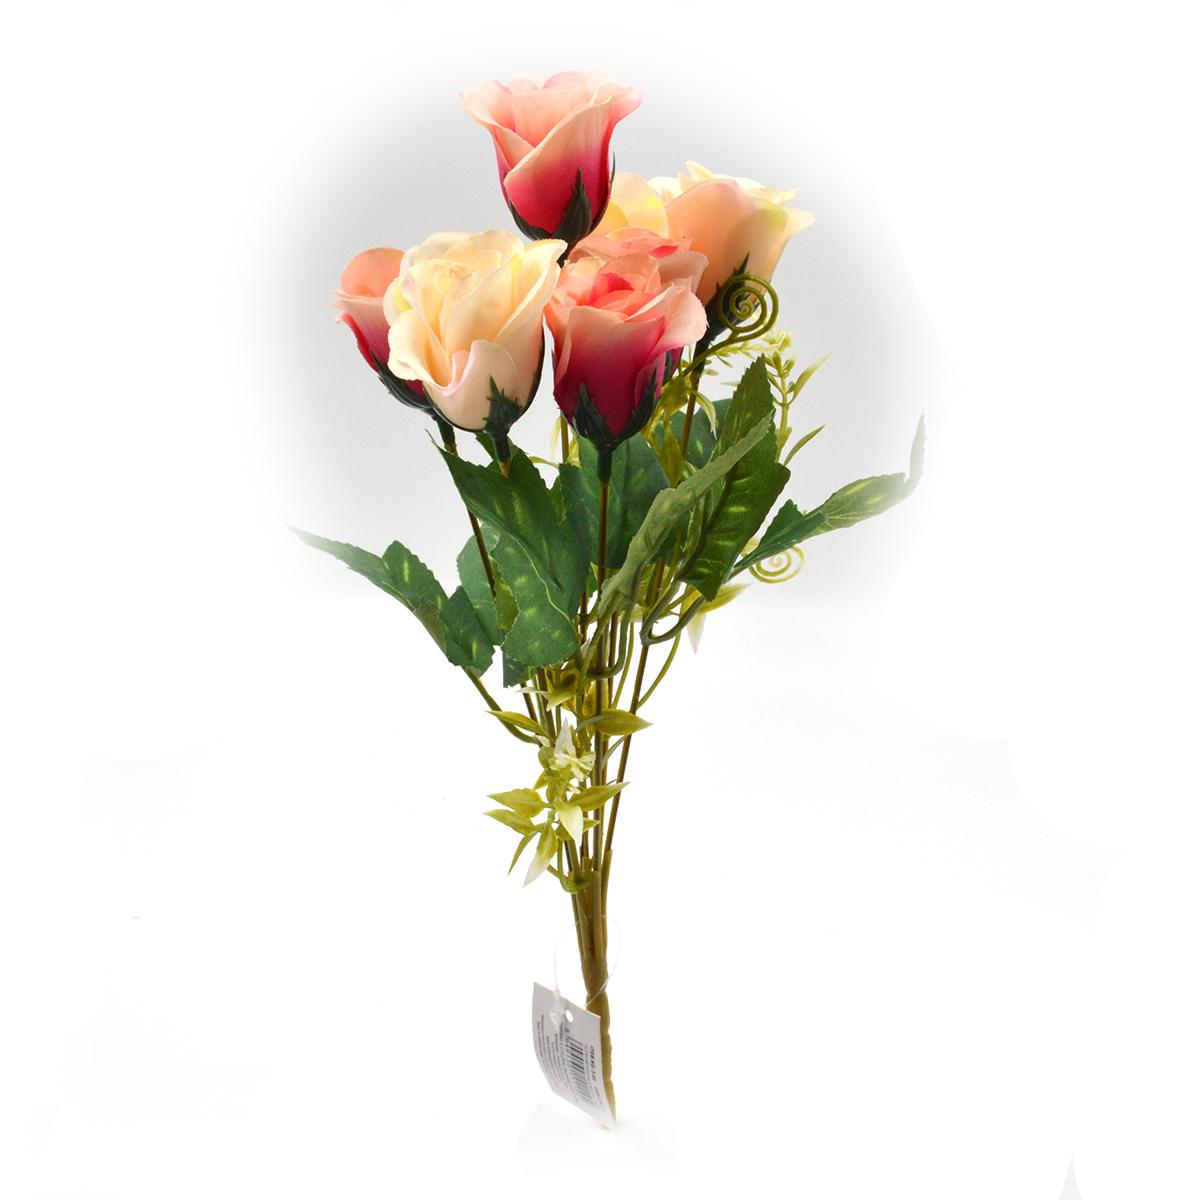 Flori Buchet 7 trandafiri wild crem cu roz intens